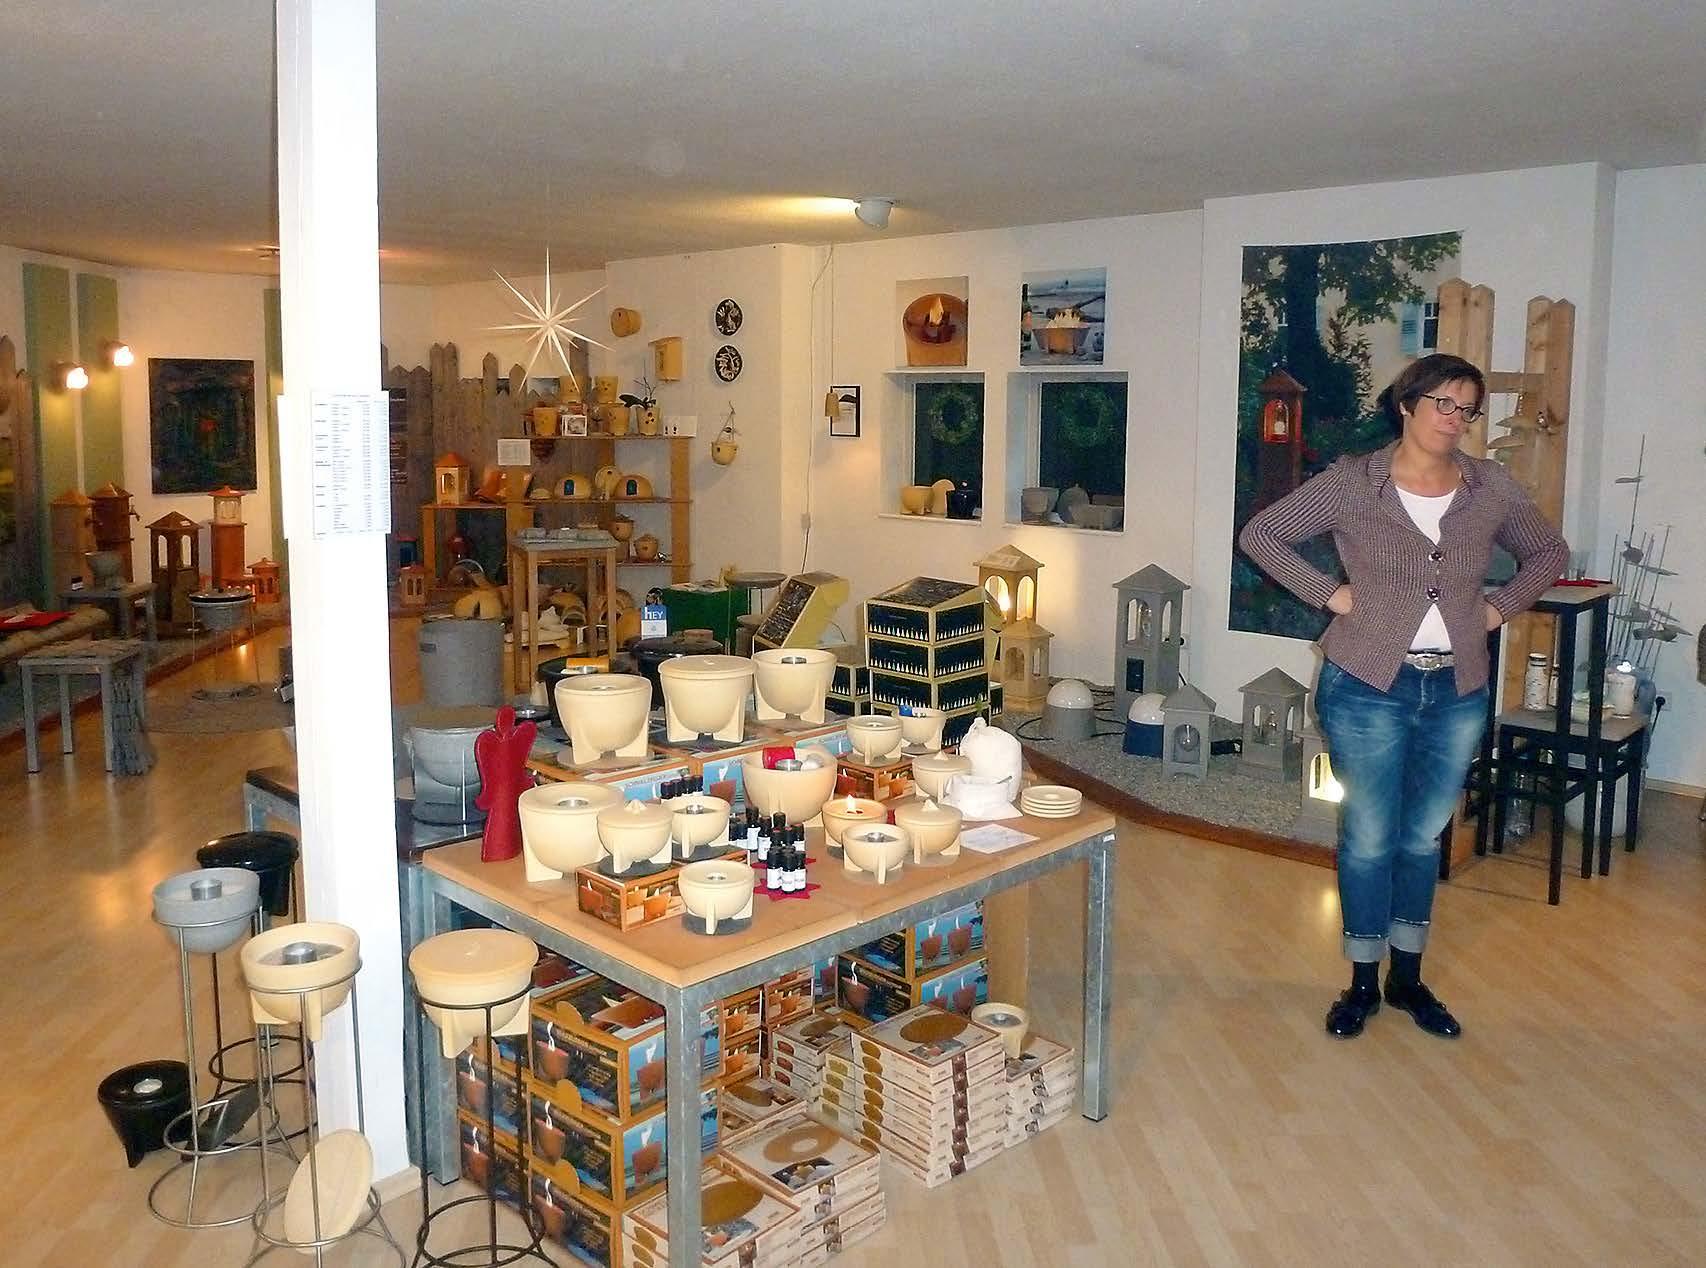 Blick in den Verkaufsraum vor Ort